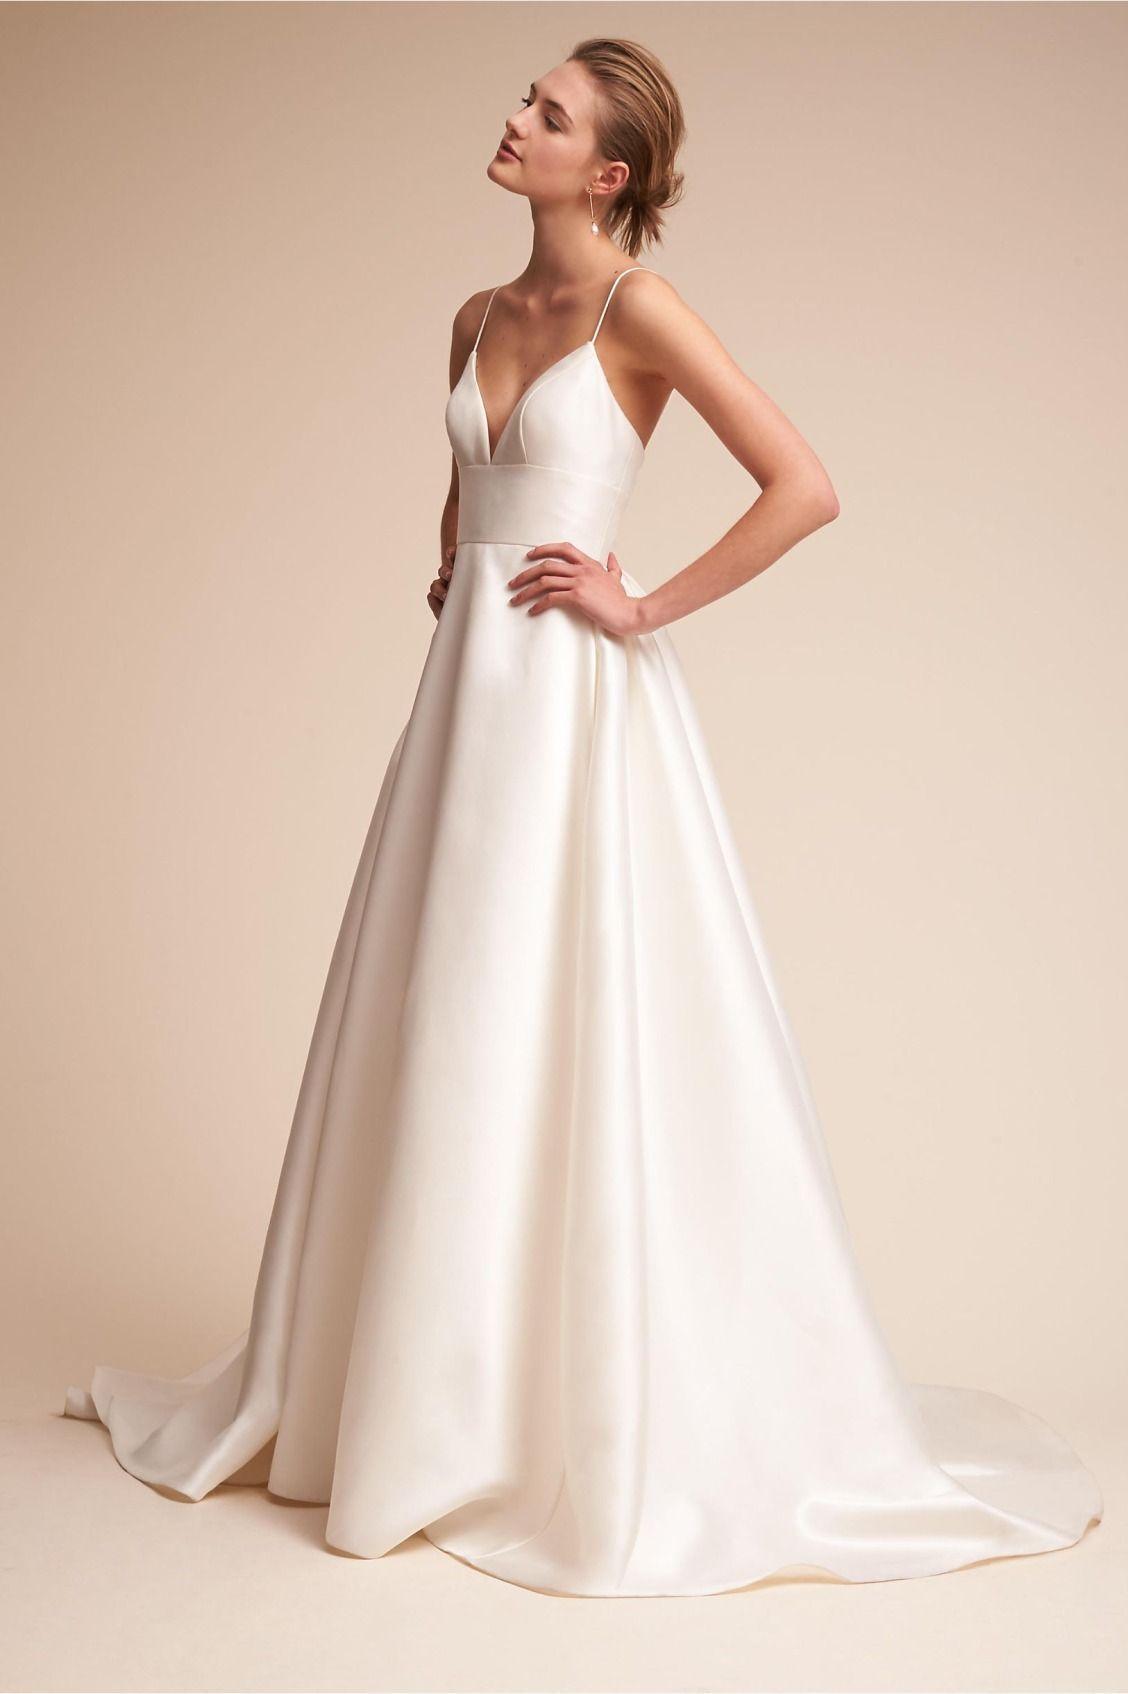 Hochzeitskleid Modern #hochzeitskleidmodern  Hochzeitskleid